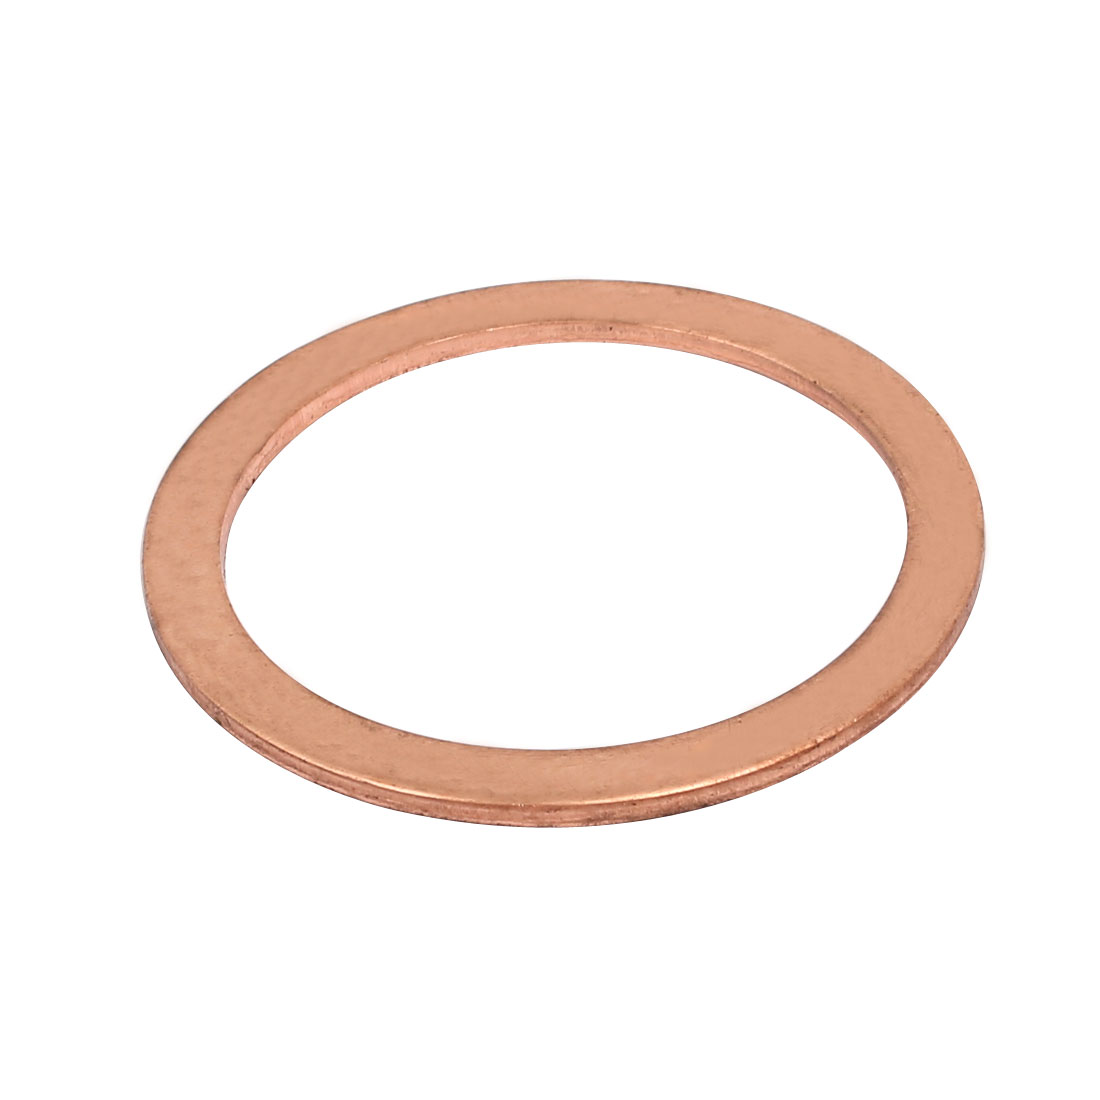 42mmx52mmx2mm Copper Flat Ring Sealing Crush Washer Gasket